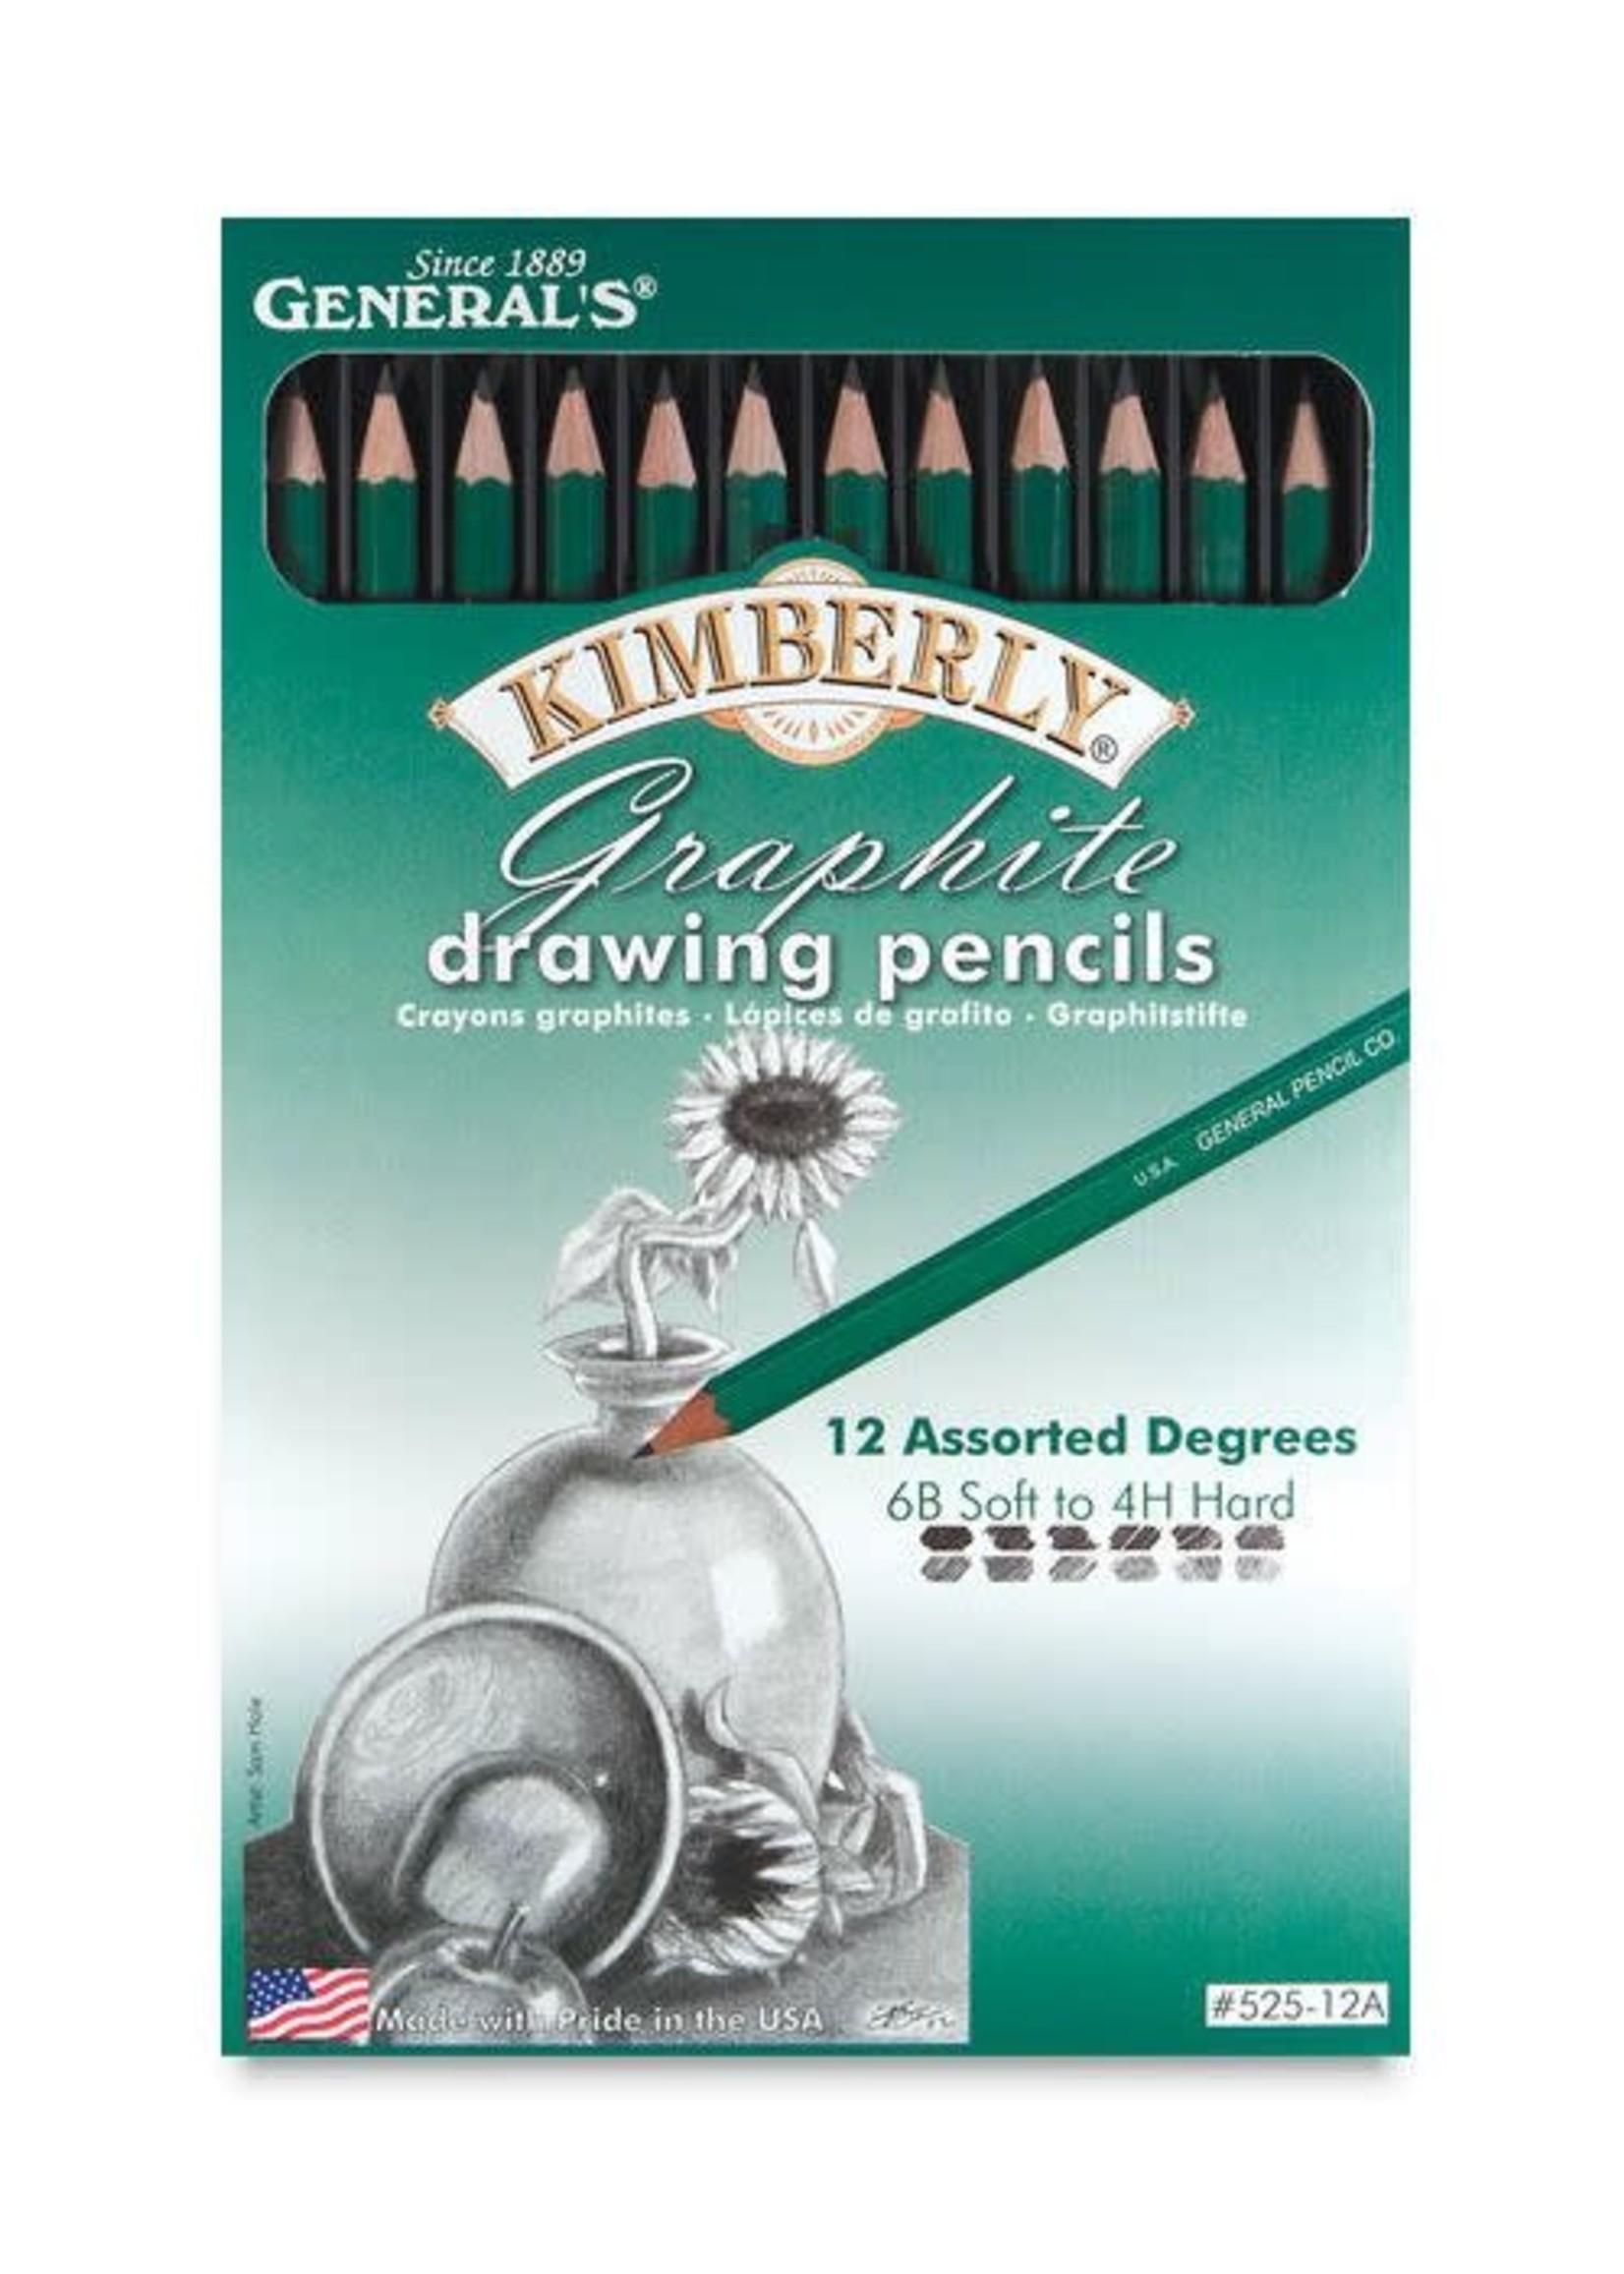 GENERAL PENCIL CO., INC. KIMBERLY DRAWING PENCIL (SETS)